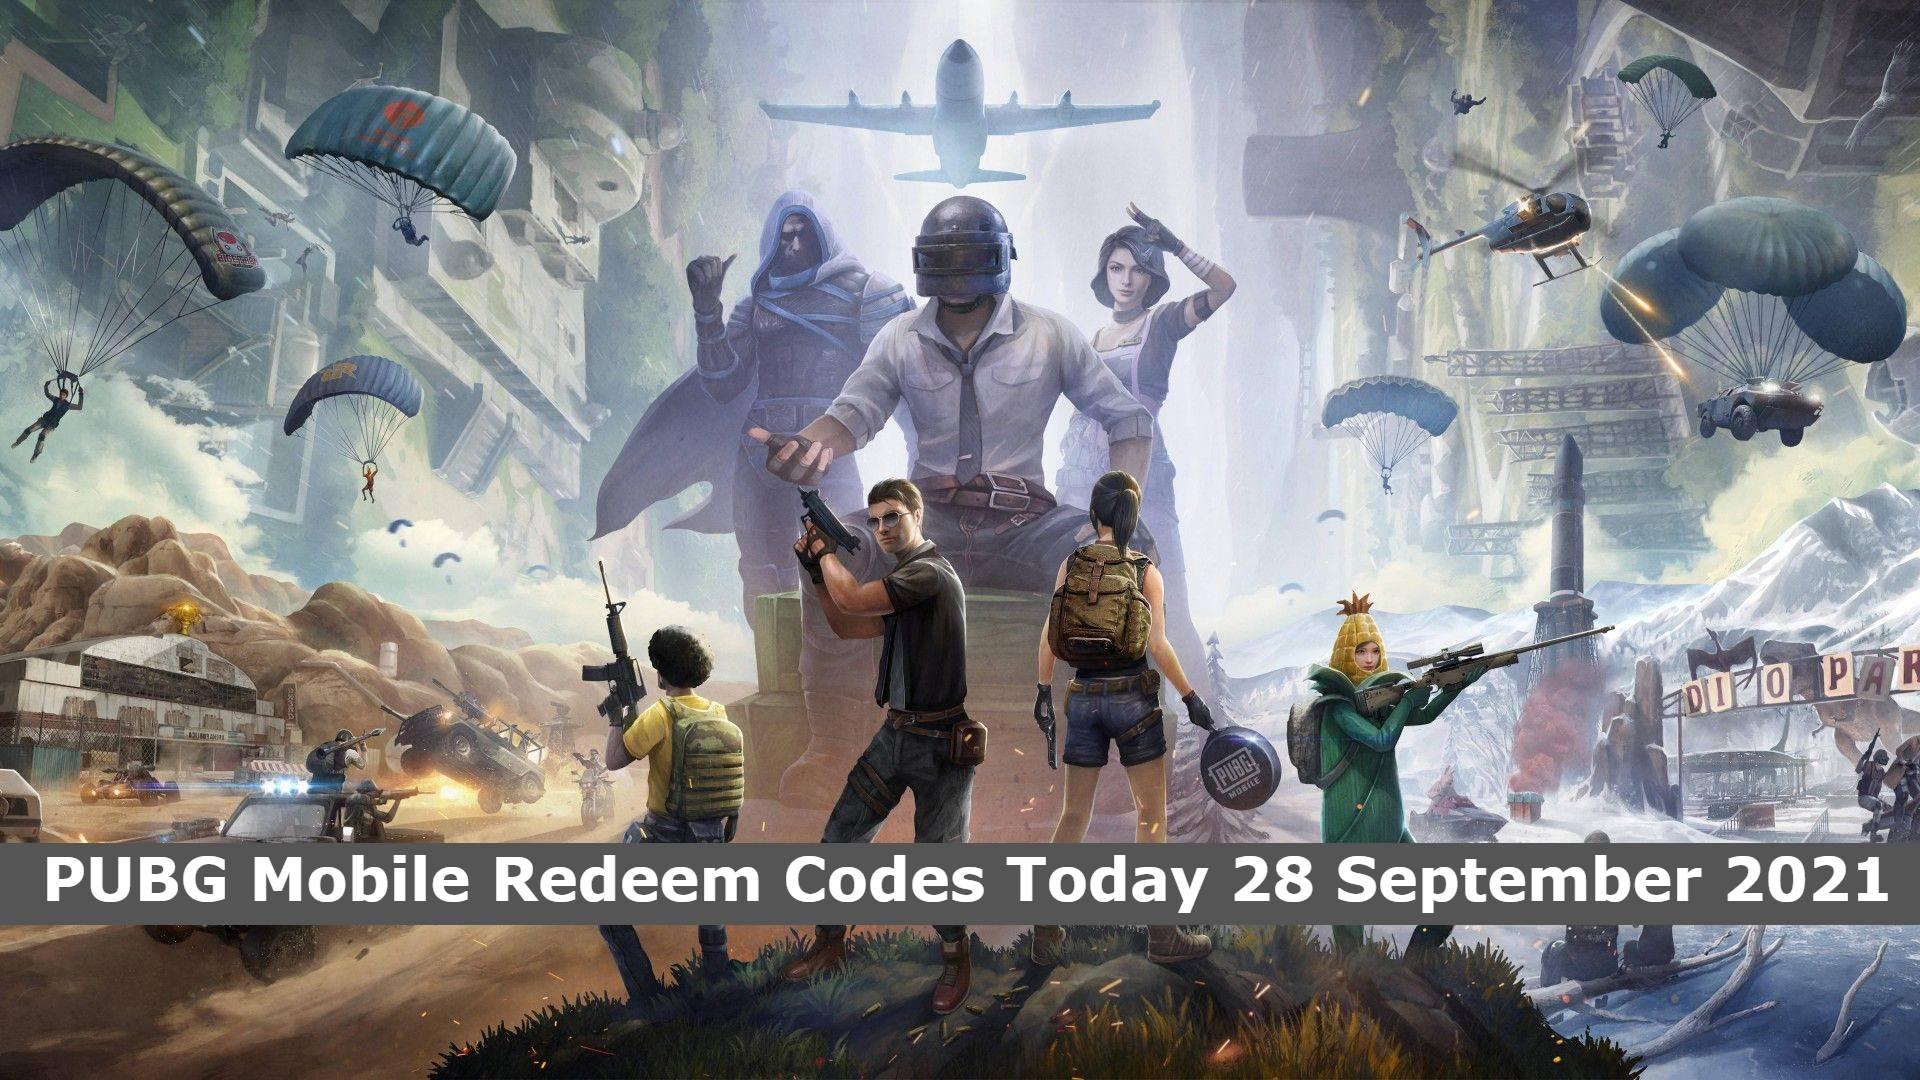 PUBG Mobile Redeem Codes Today 28 September 2021